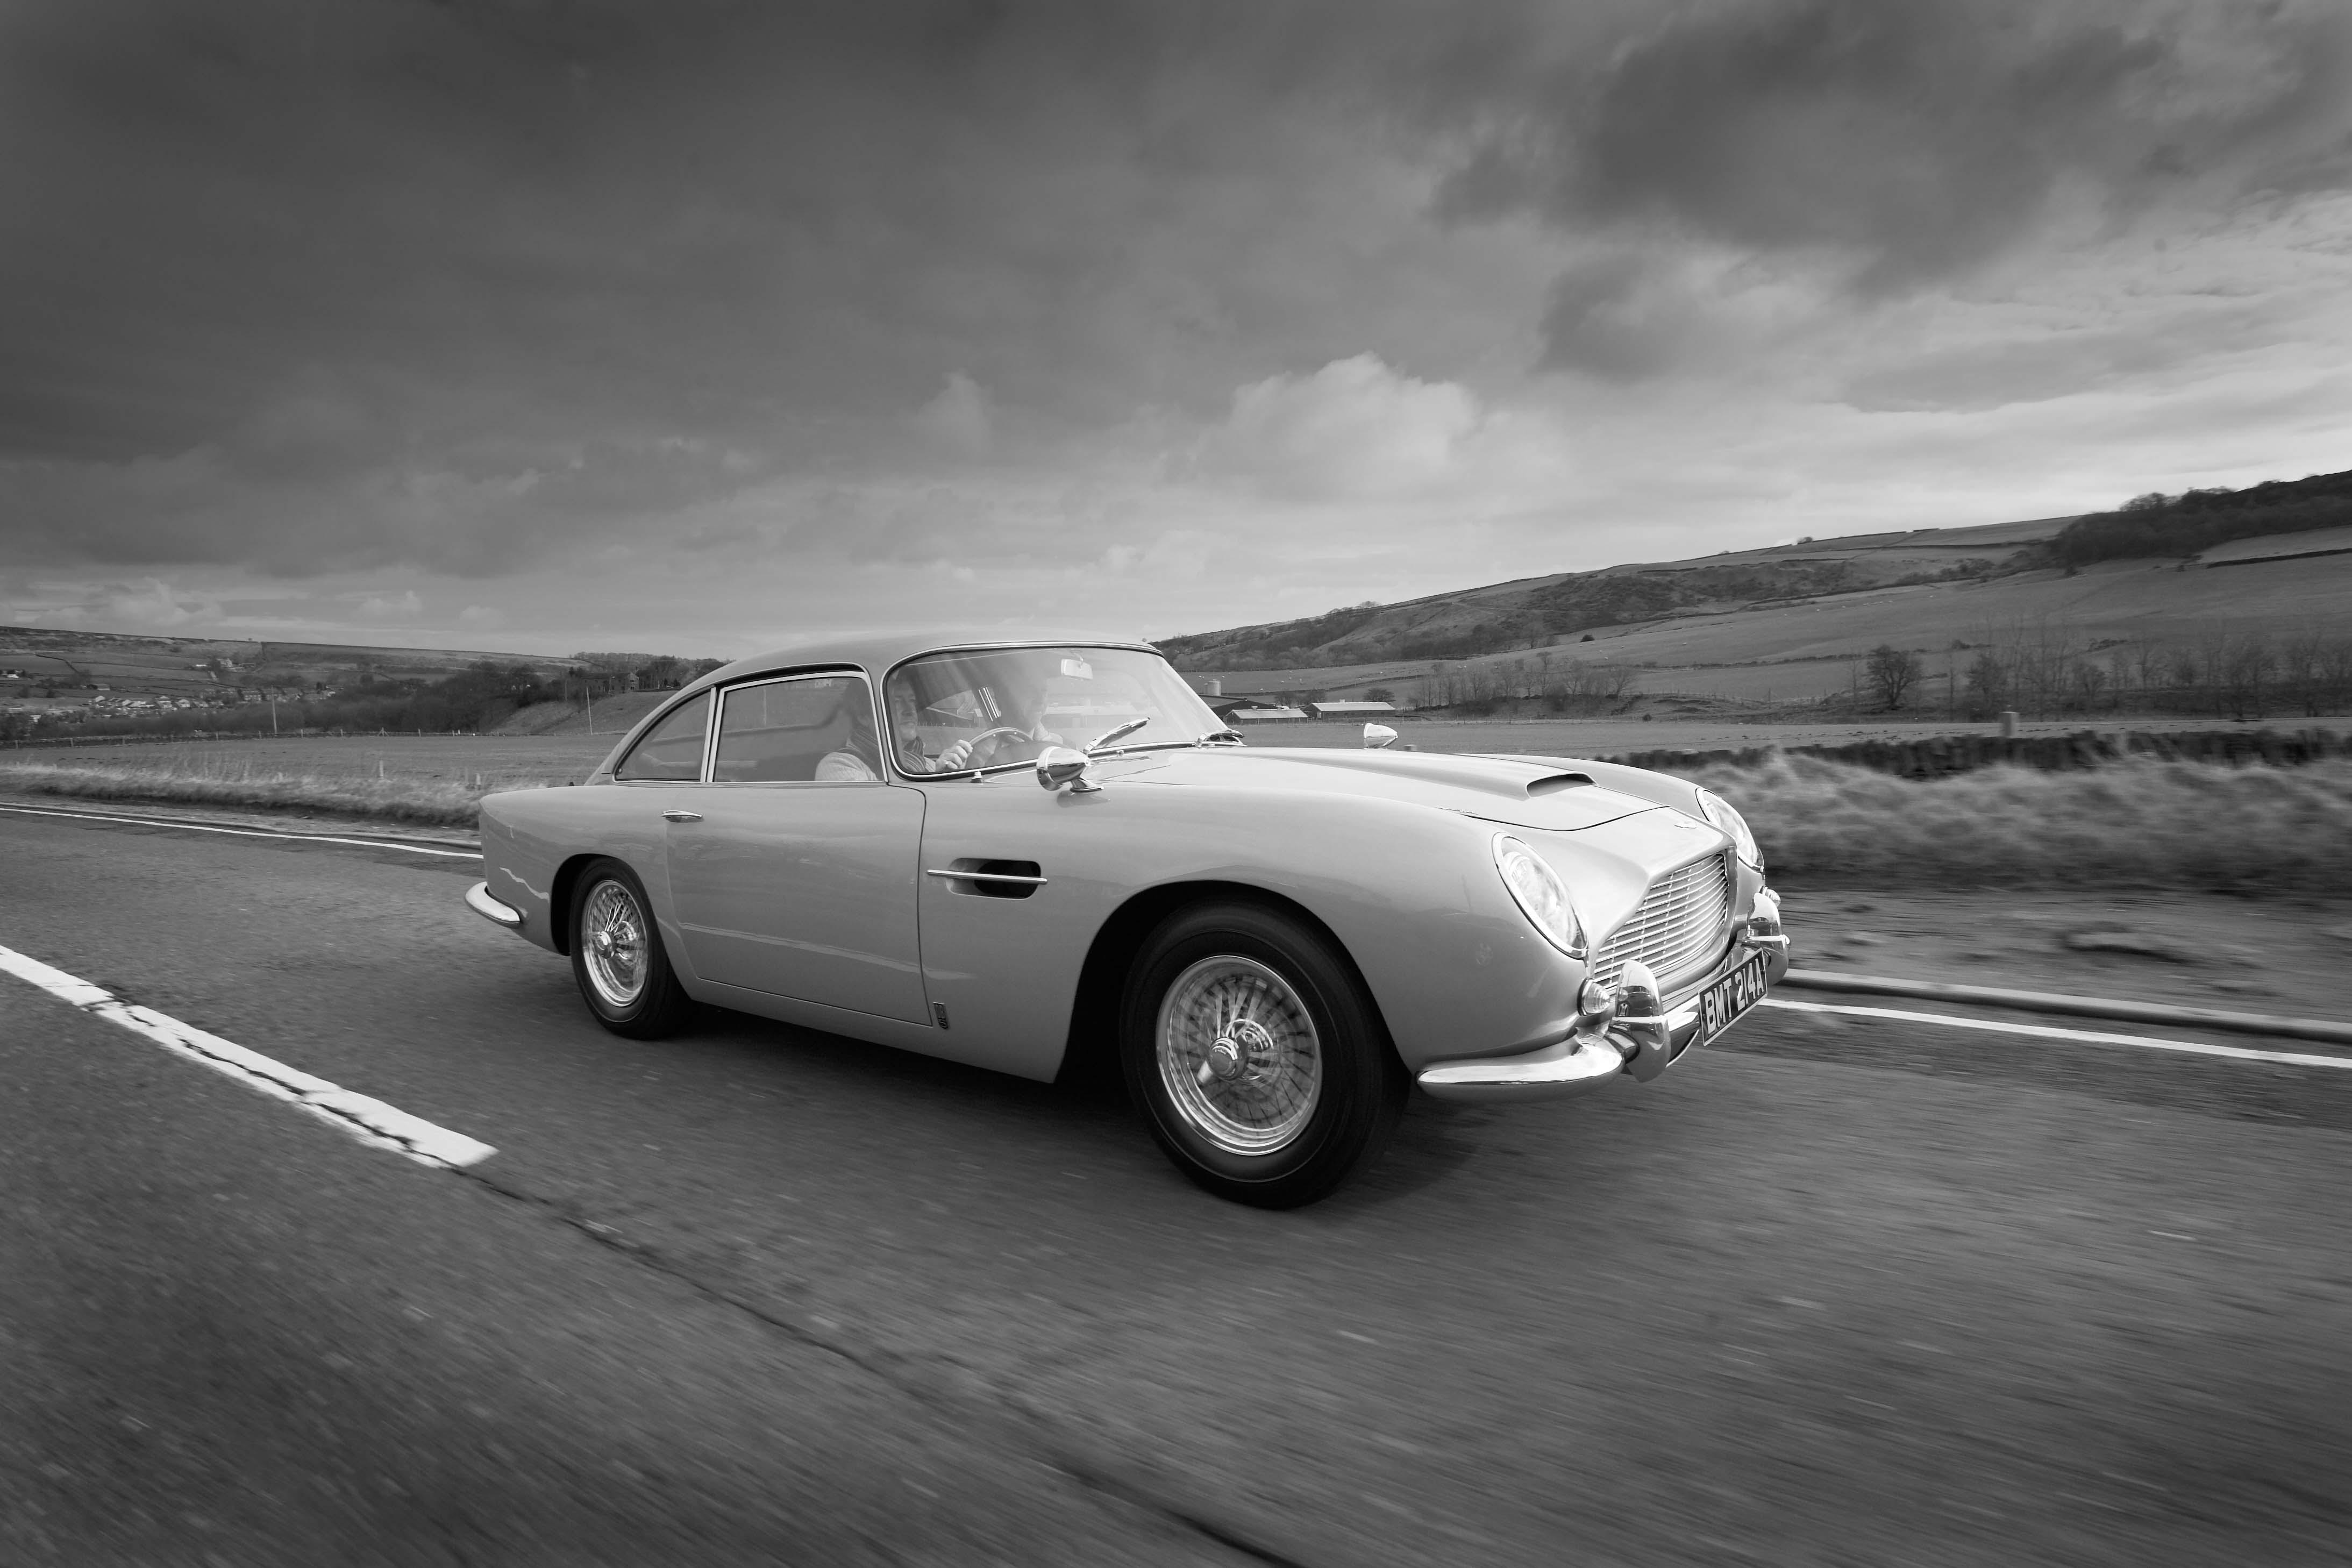 1965 Aston Martin DB5 Black and White